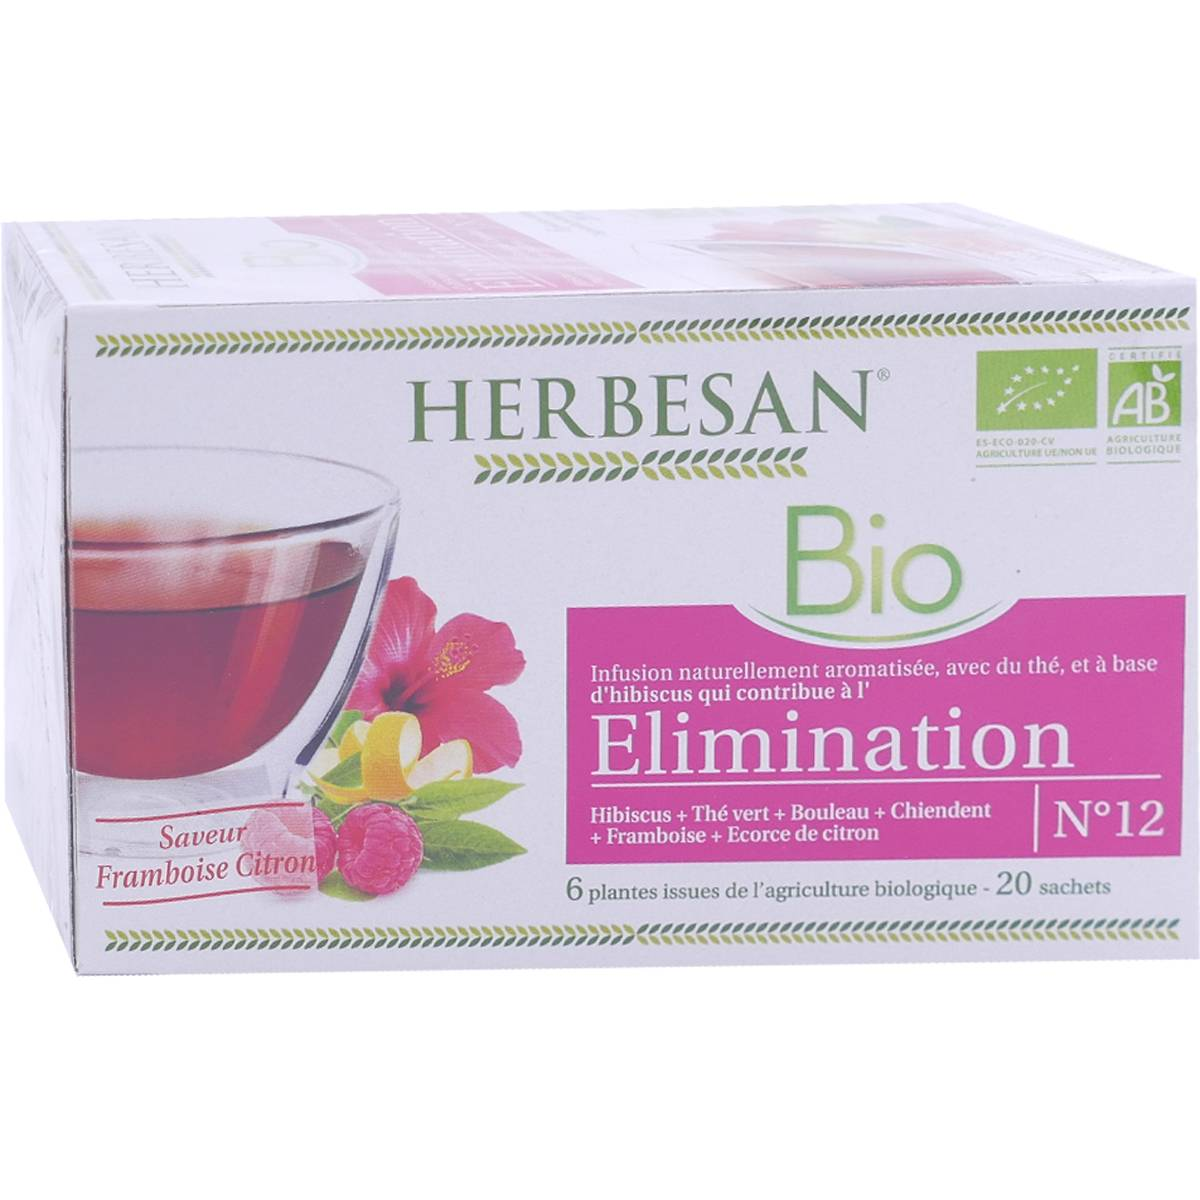 Herbesan bio elimination saveur framboise citron 20 sachets